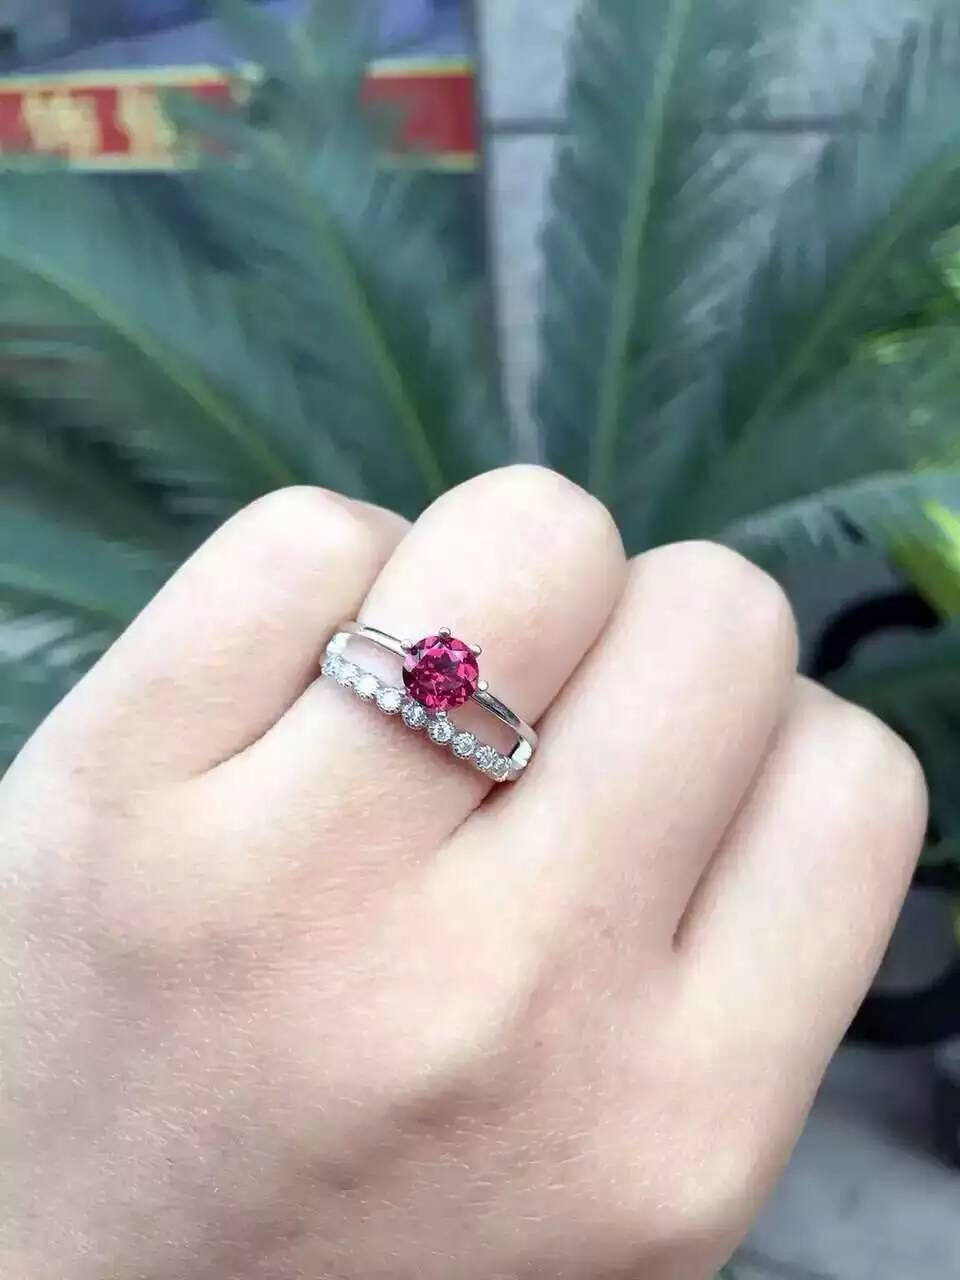 Natural Red Garnet Gem Ring Gemstone S925 Sterling Torch Tunik Women Burgundy Maroon Xl Silver Trendy Elegant Two Layers Round Wedding Jewelry